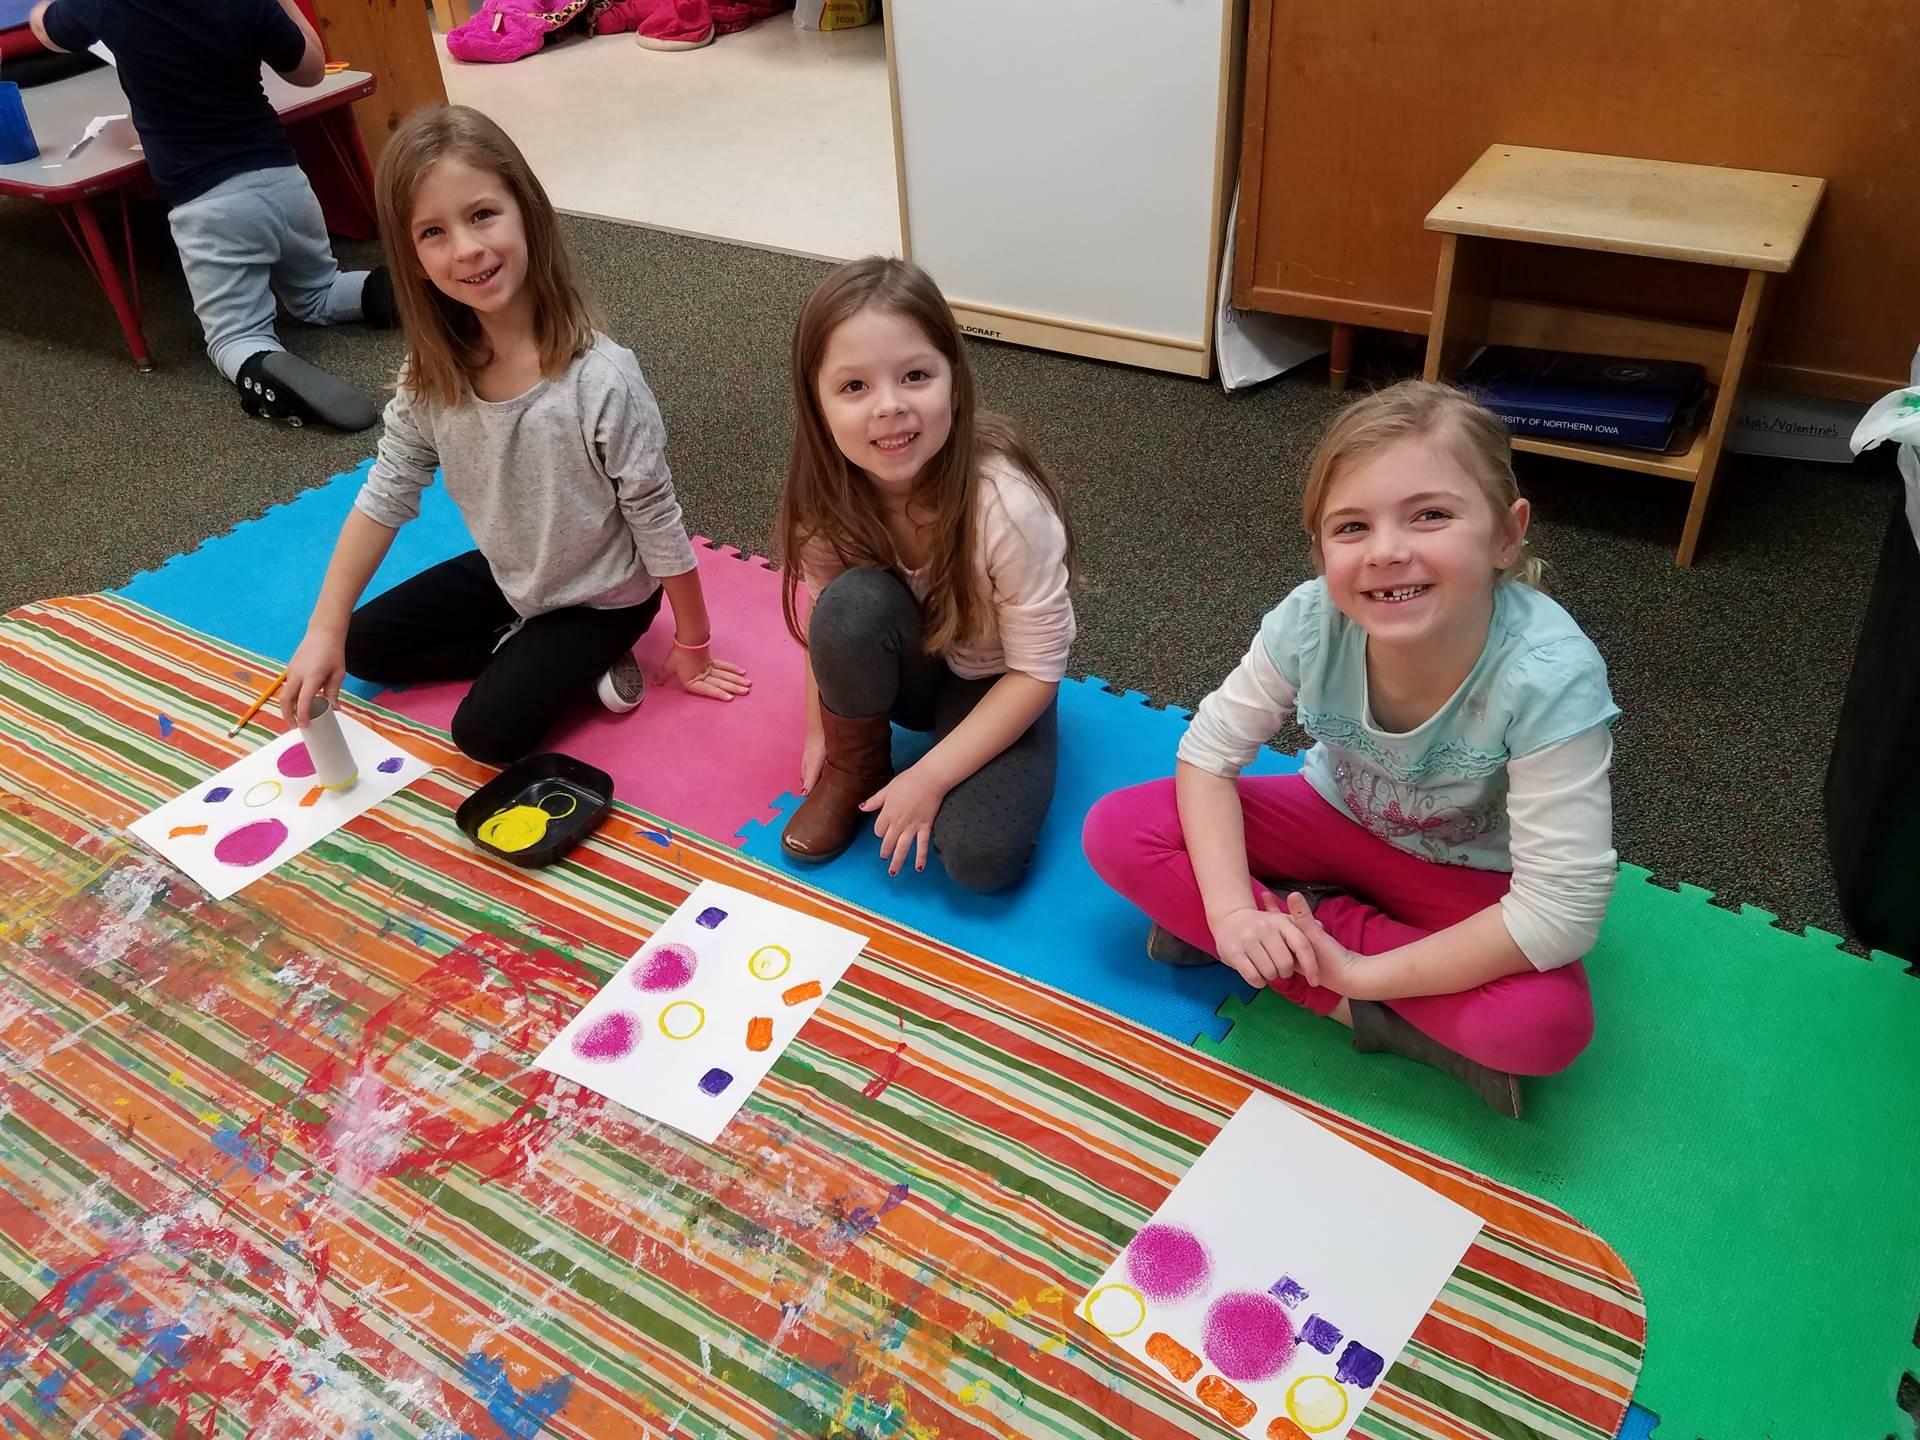 3 kids painting